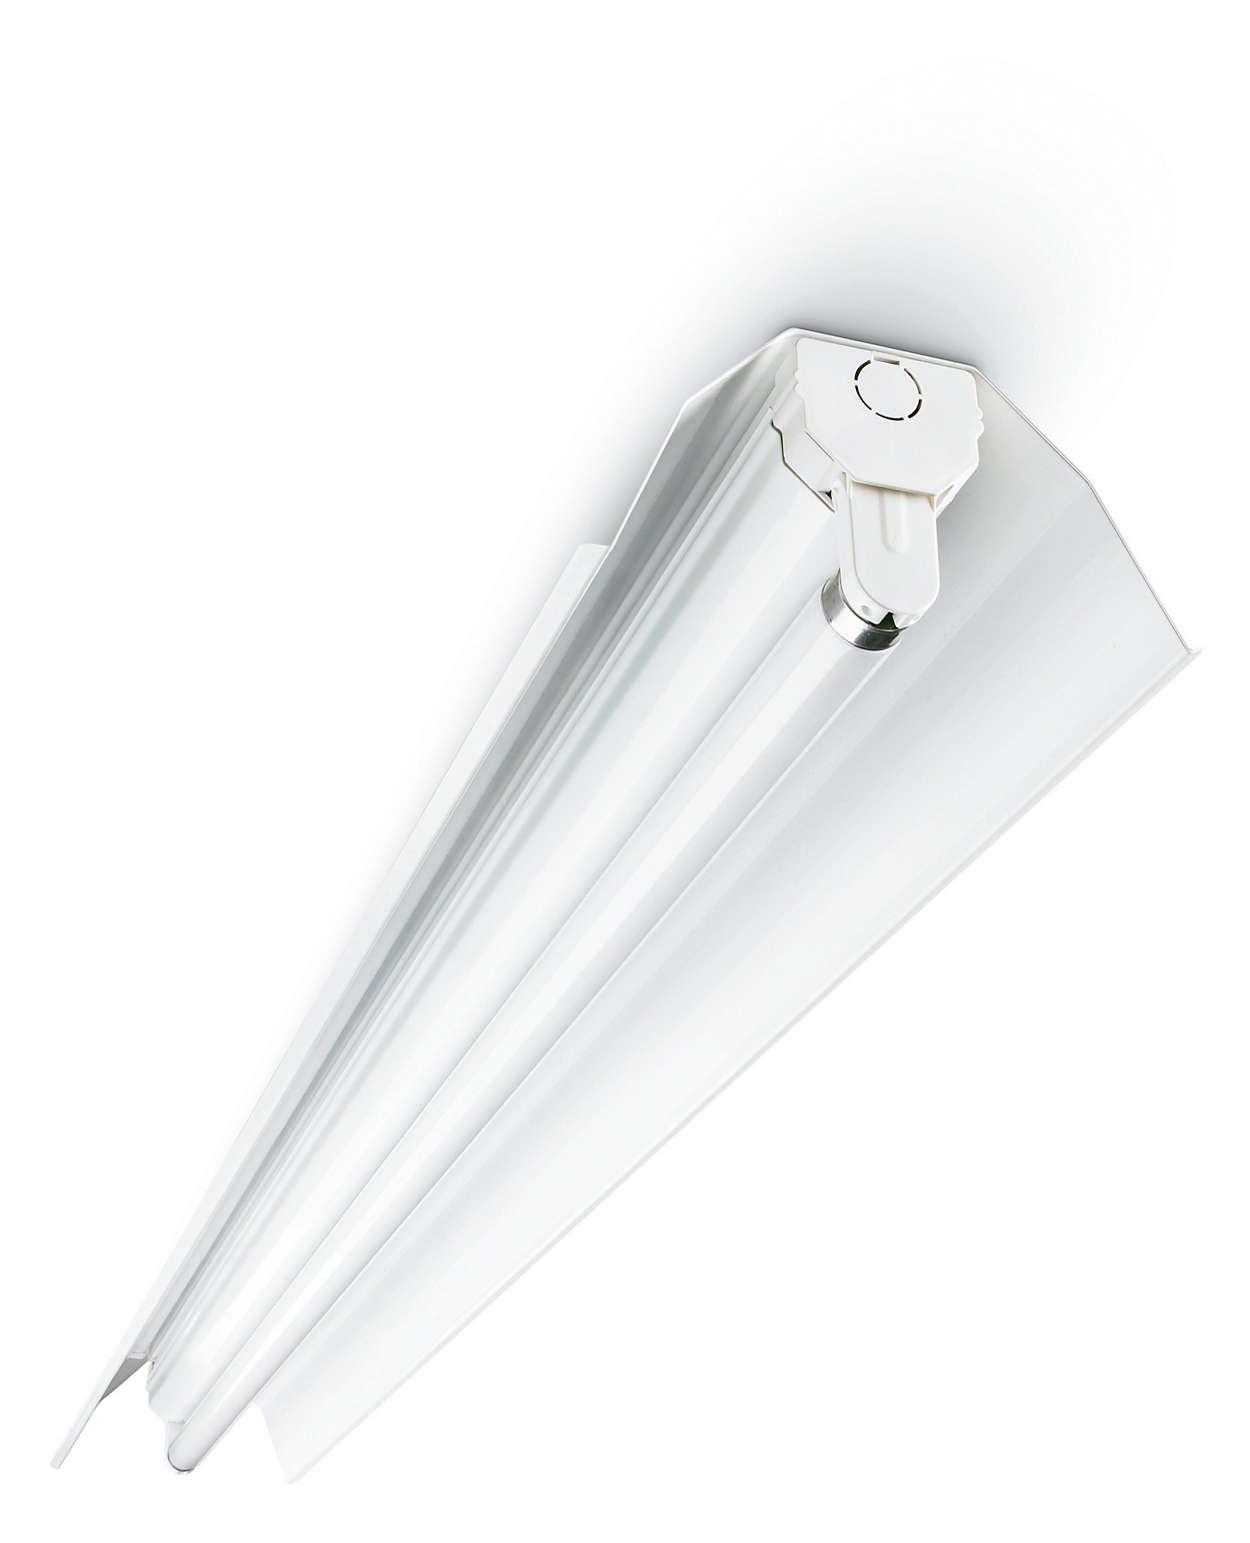 tms 022 regletas philips lighting. Black Bedroom Furniture Sets. Home Design Ideas